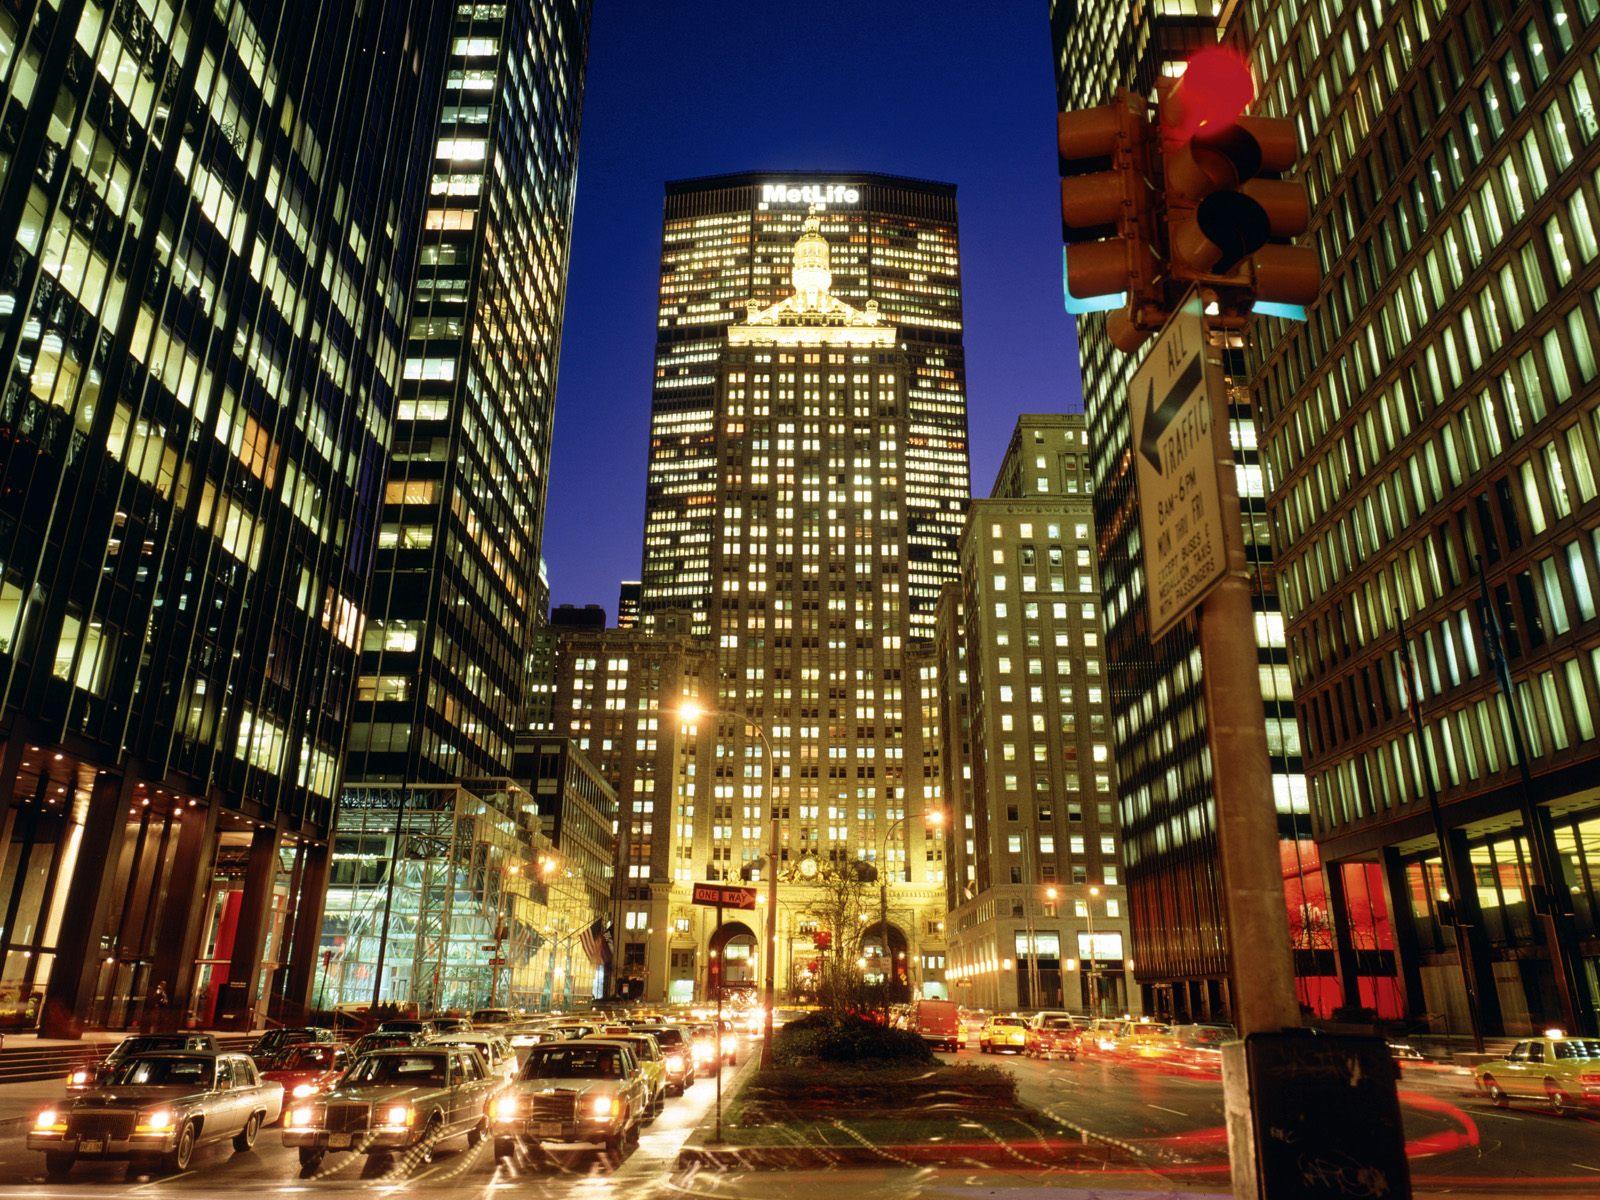 http://1.bp.blogspot.com/-4G08MGYWFYM/TbKMufQ2xHI/AAAAAAAAAMU/xZWcyGZxbEw/s1600/Park-Avenue-New-York-City-New-York-1-1600x1200.jpg